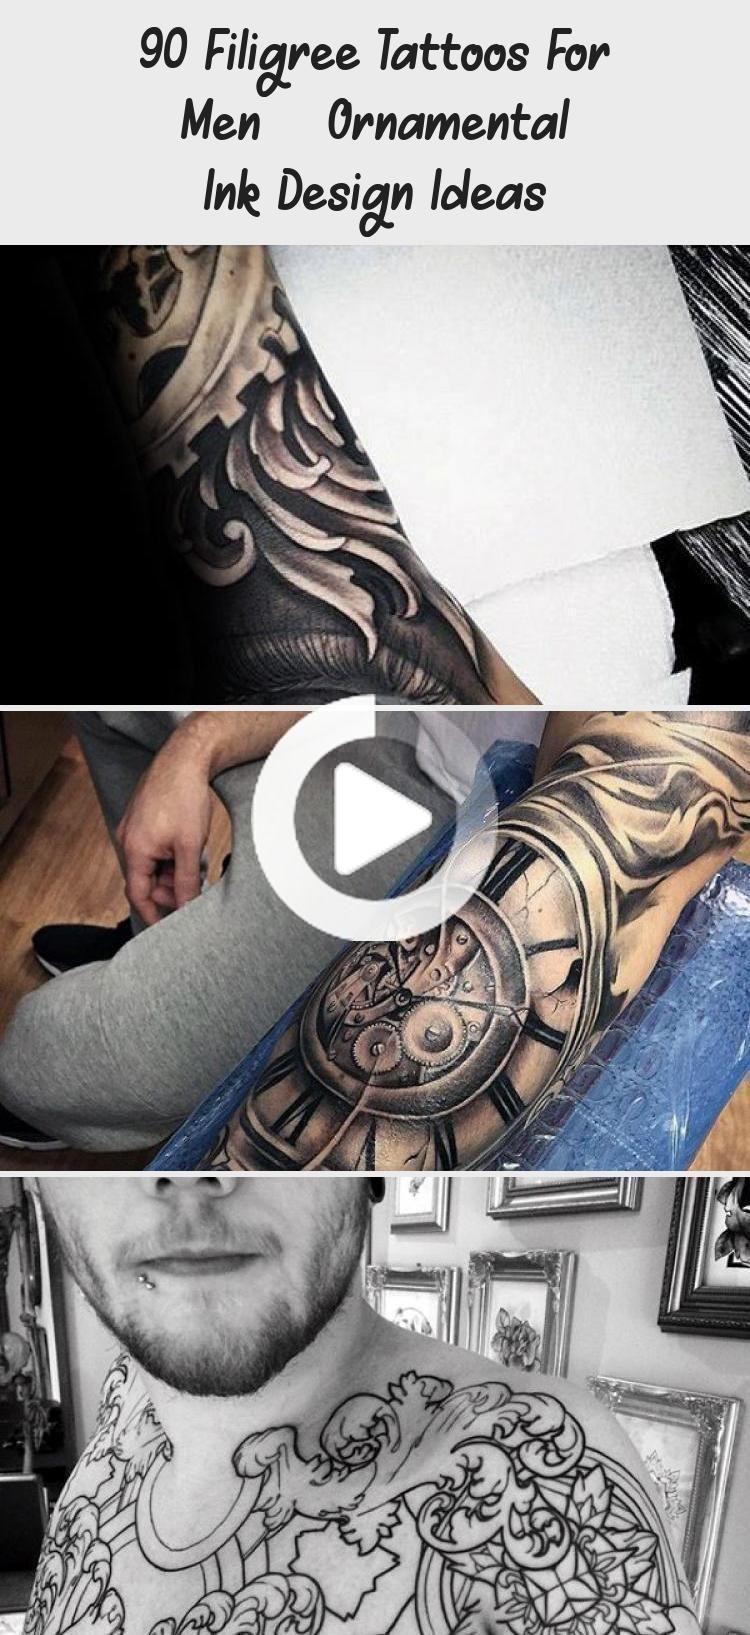 75 Magical Tattoo Designs All Millennial Girls Will Love in 2020 | Wri